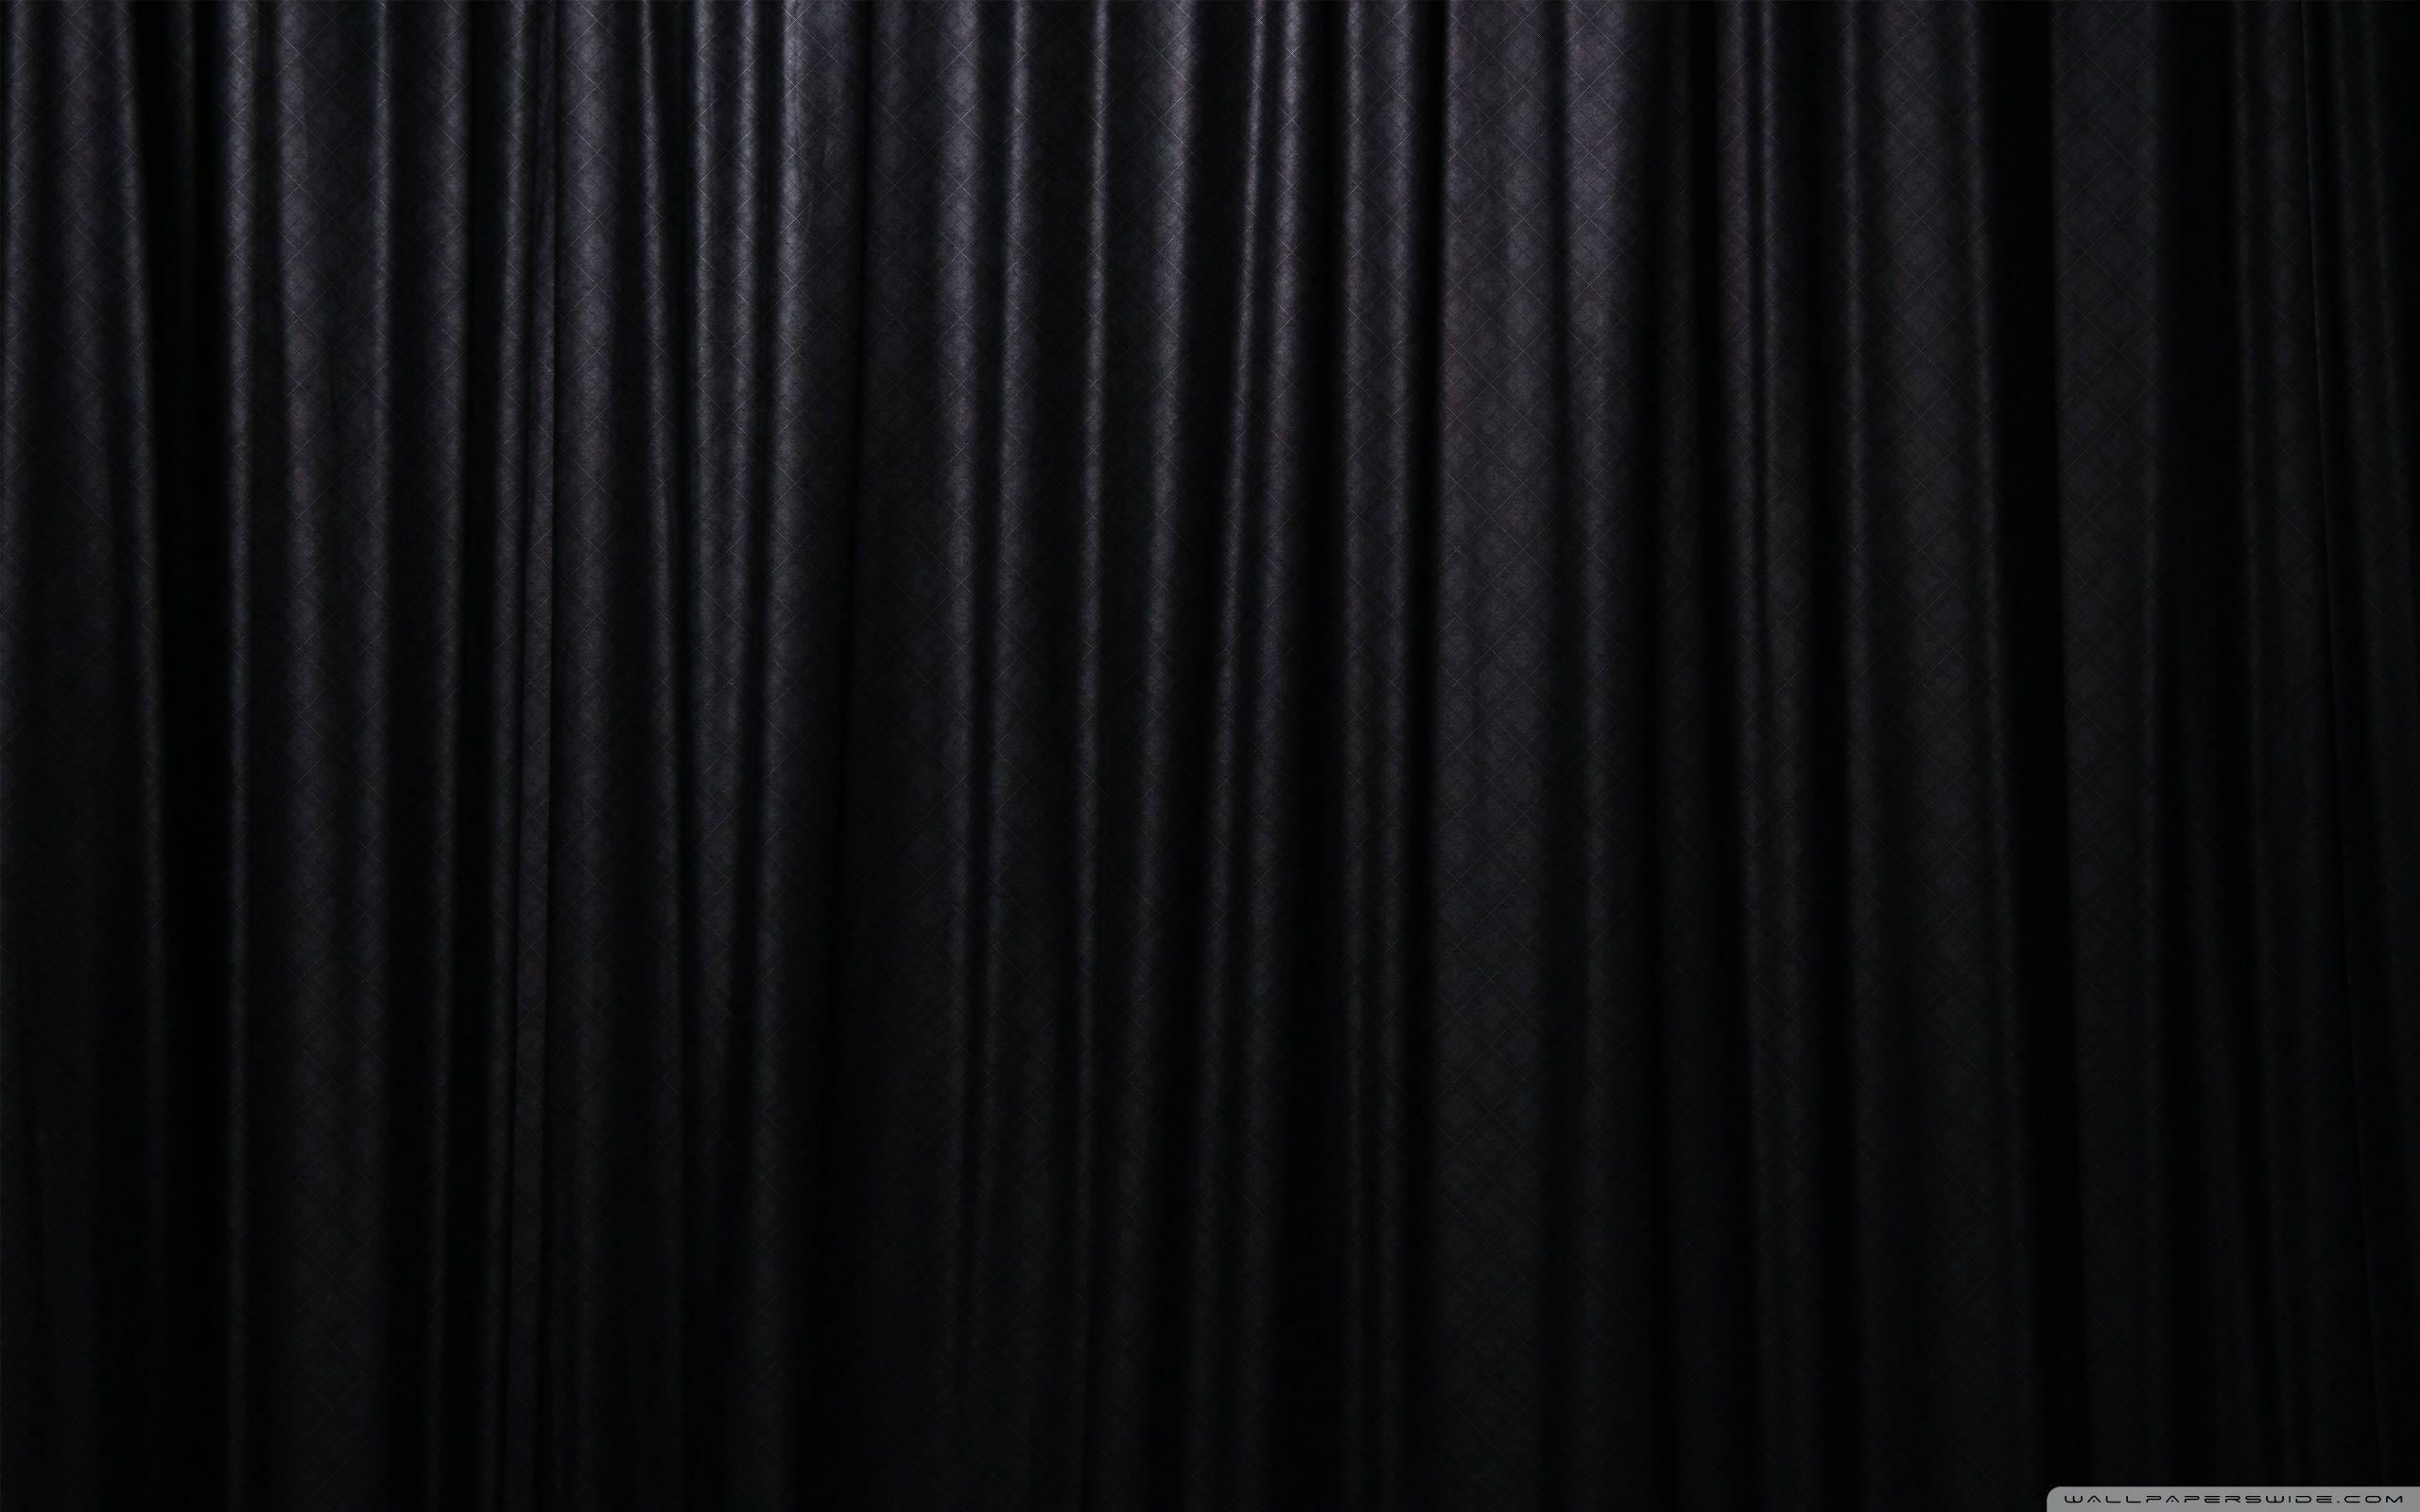 Black Curtain Black Curtains Black Wallpaper Black Hd Wallpaper